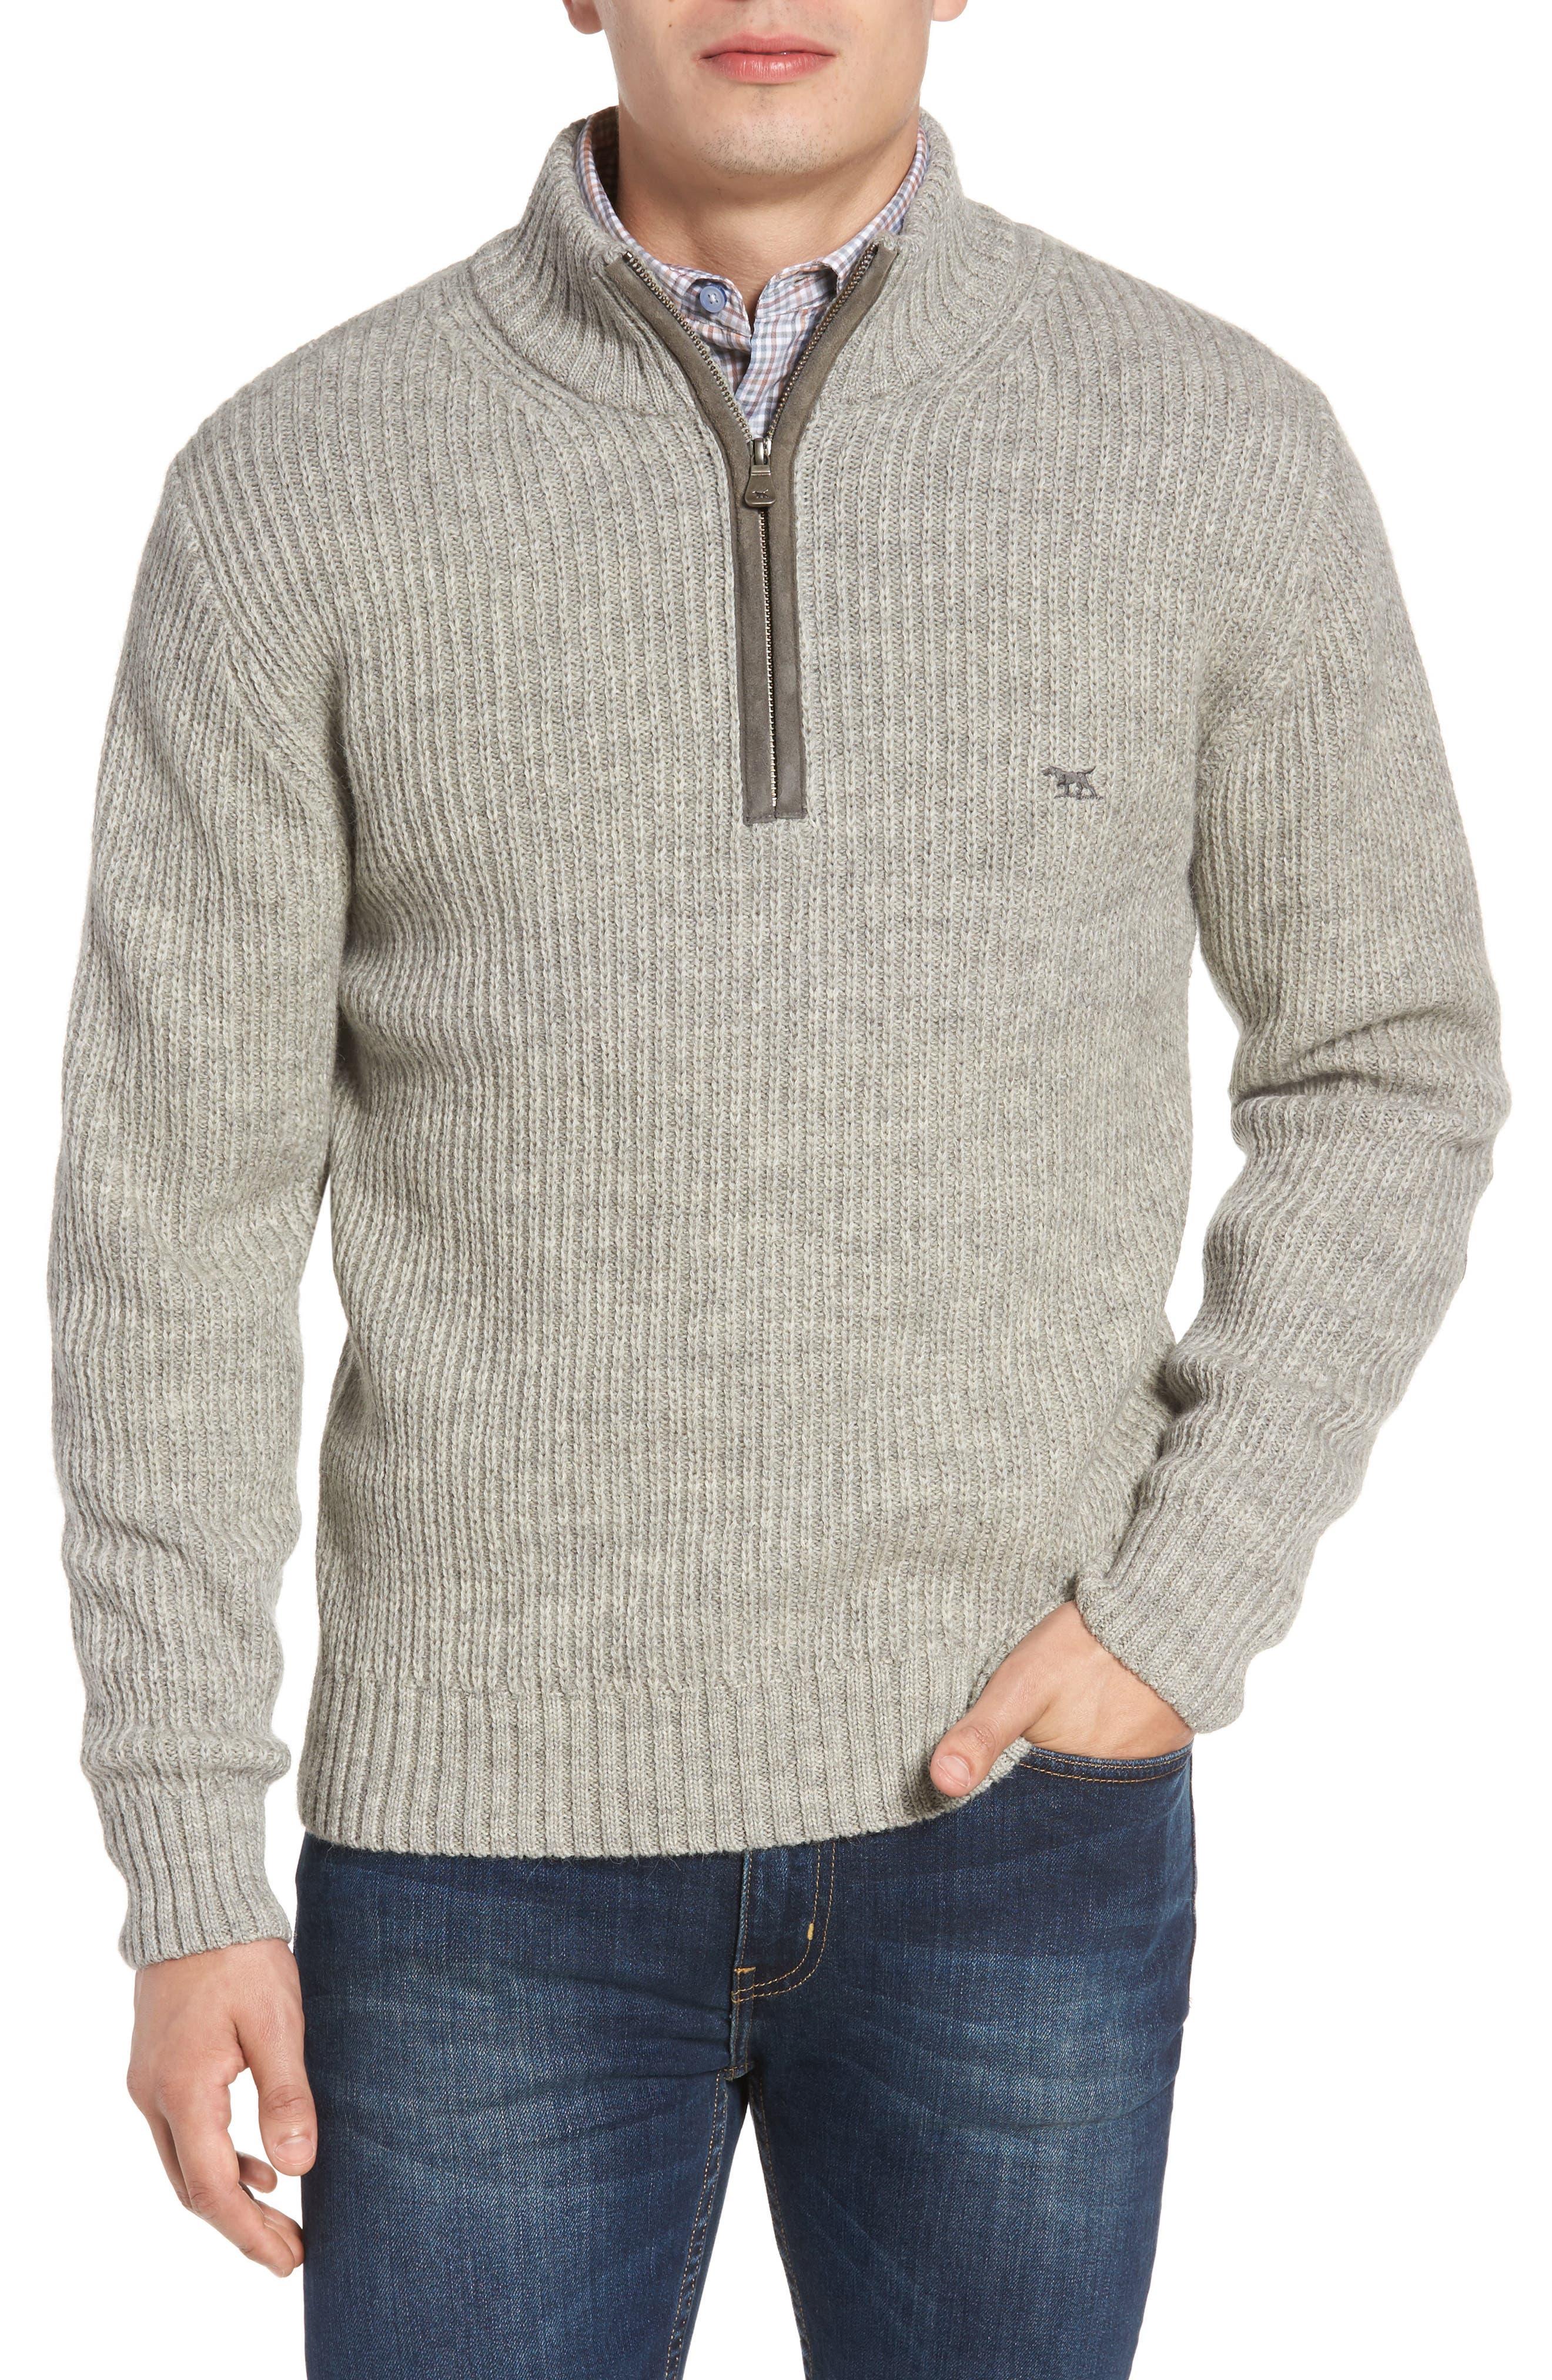 Alternate Image 1 Selected - Rodd & Gunn 'Huka Lodge' Merino Wool Blend Quarter Zip Sweater